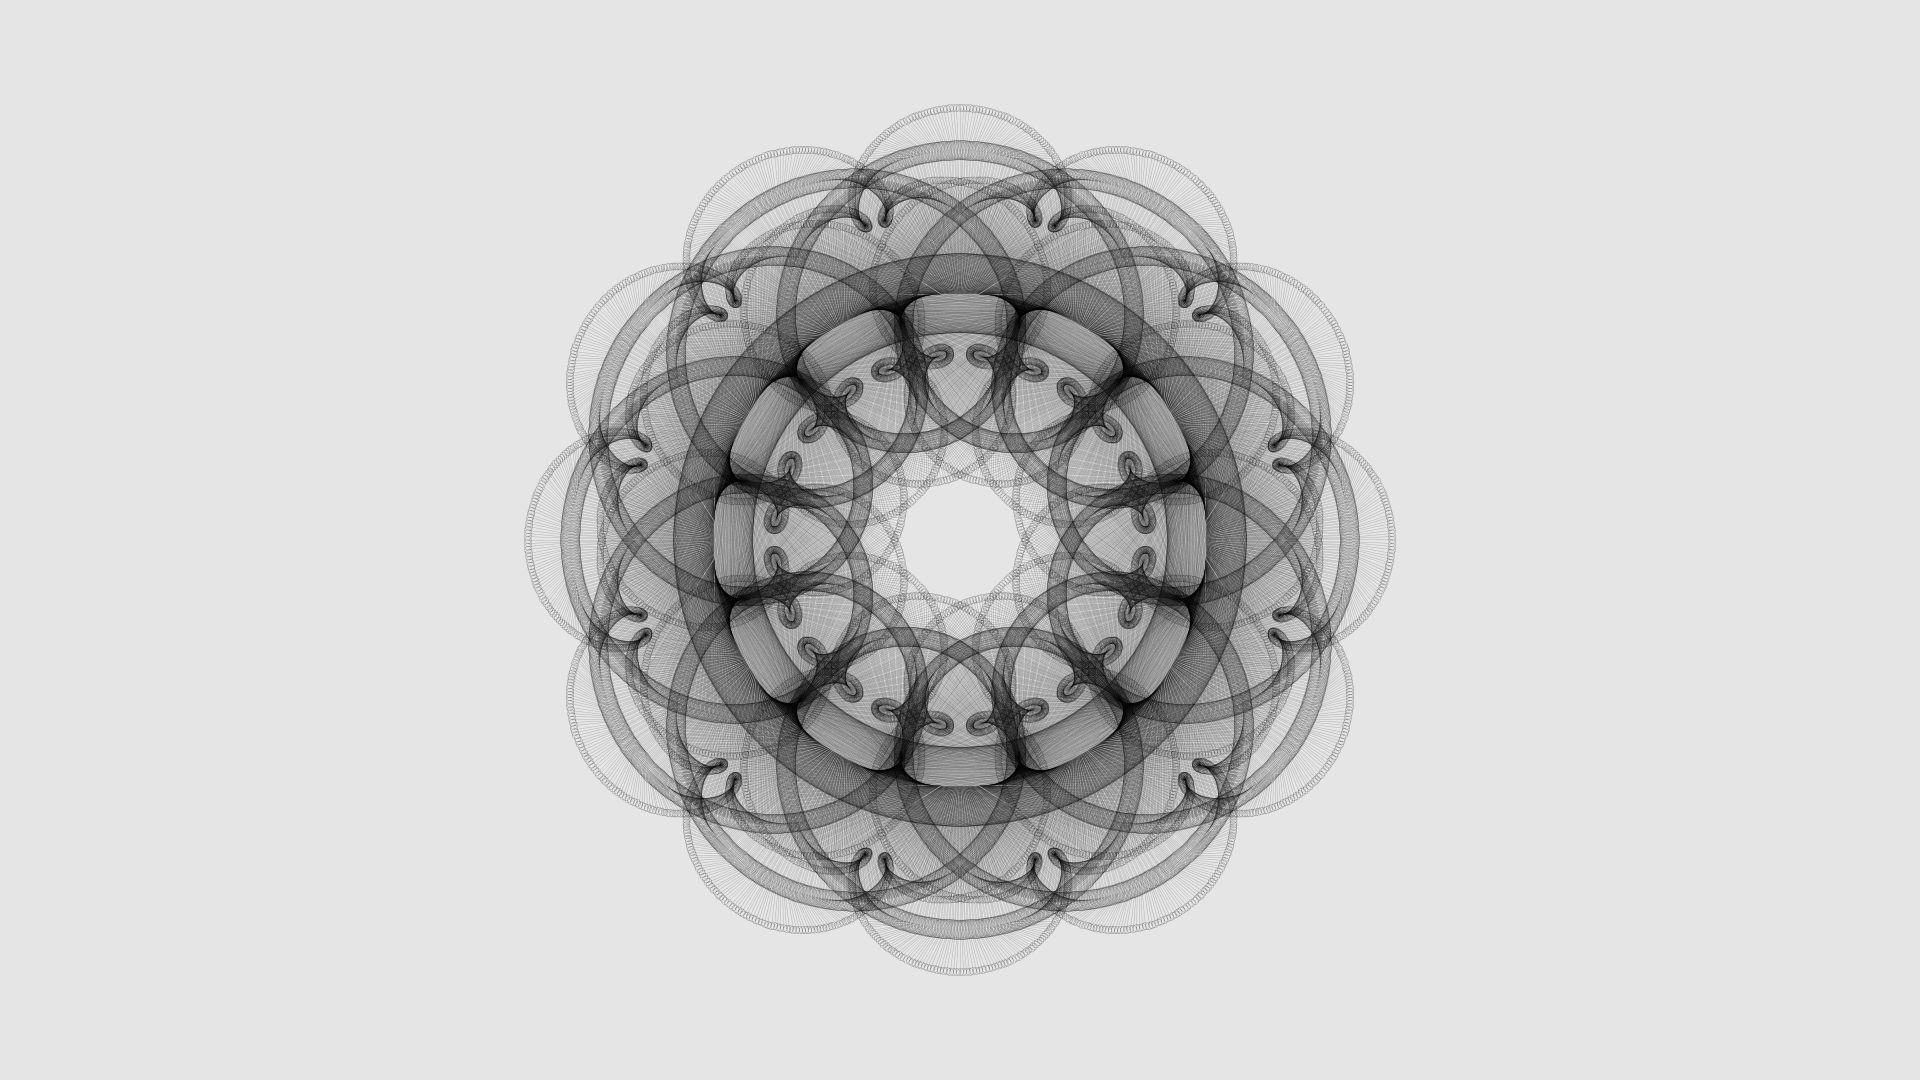 orrery-showlines-showcircles-showearth-M4E12-F8976-748-187-O246.74283-142.89275-42.364403-D79.0-19.0-7.0.png